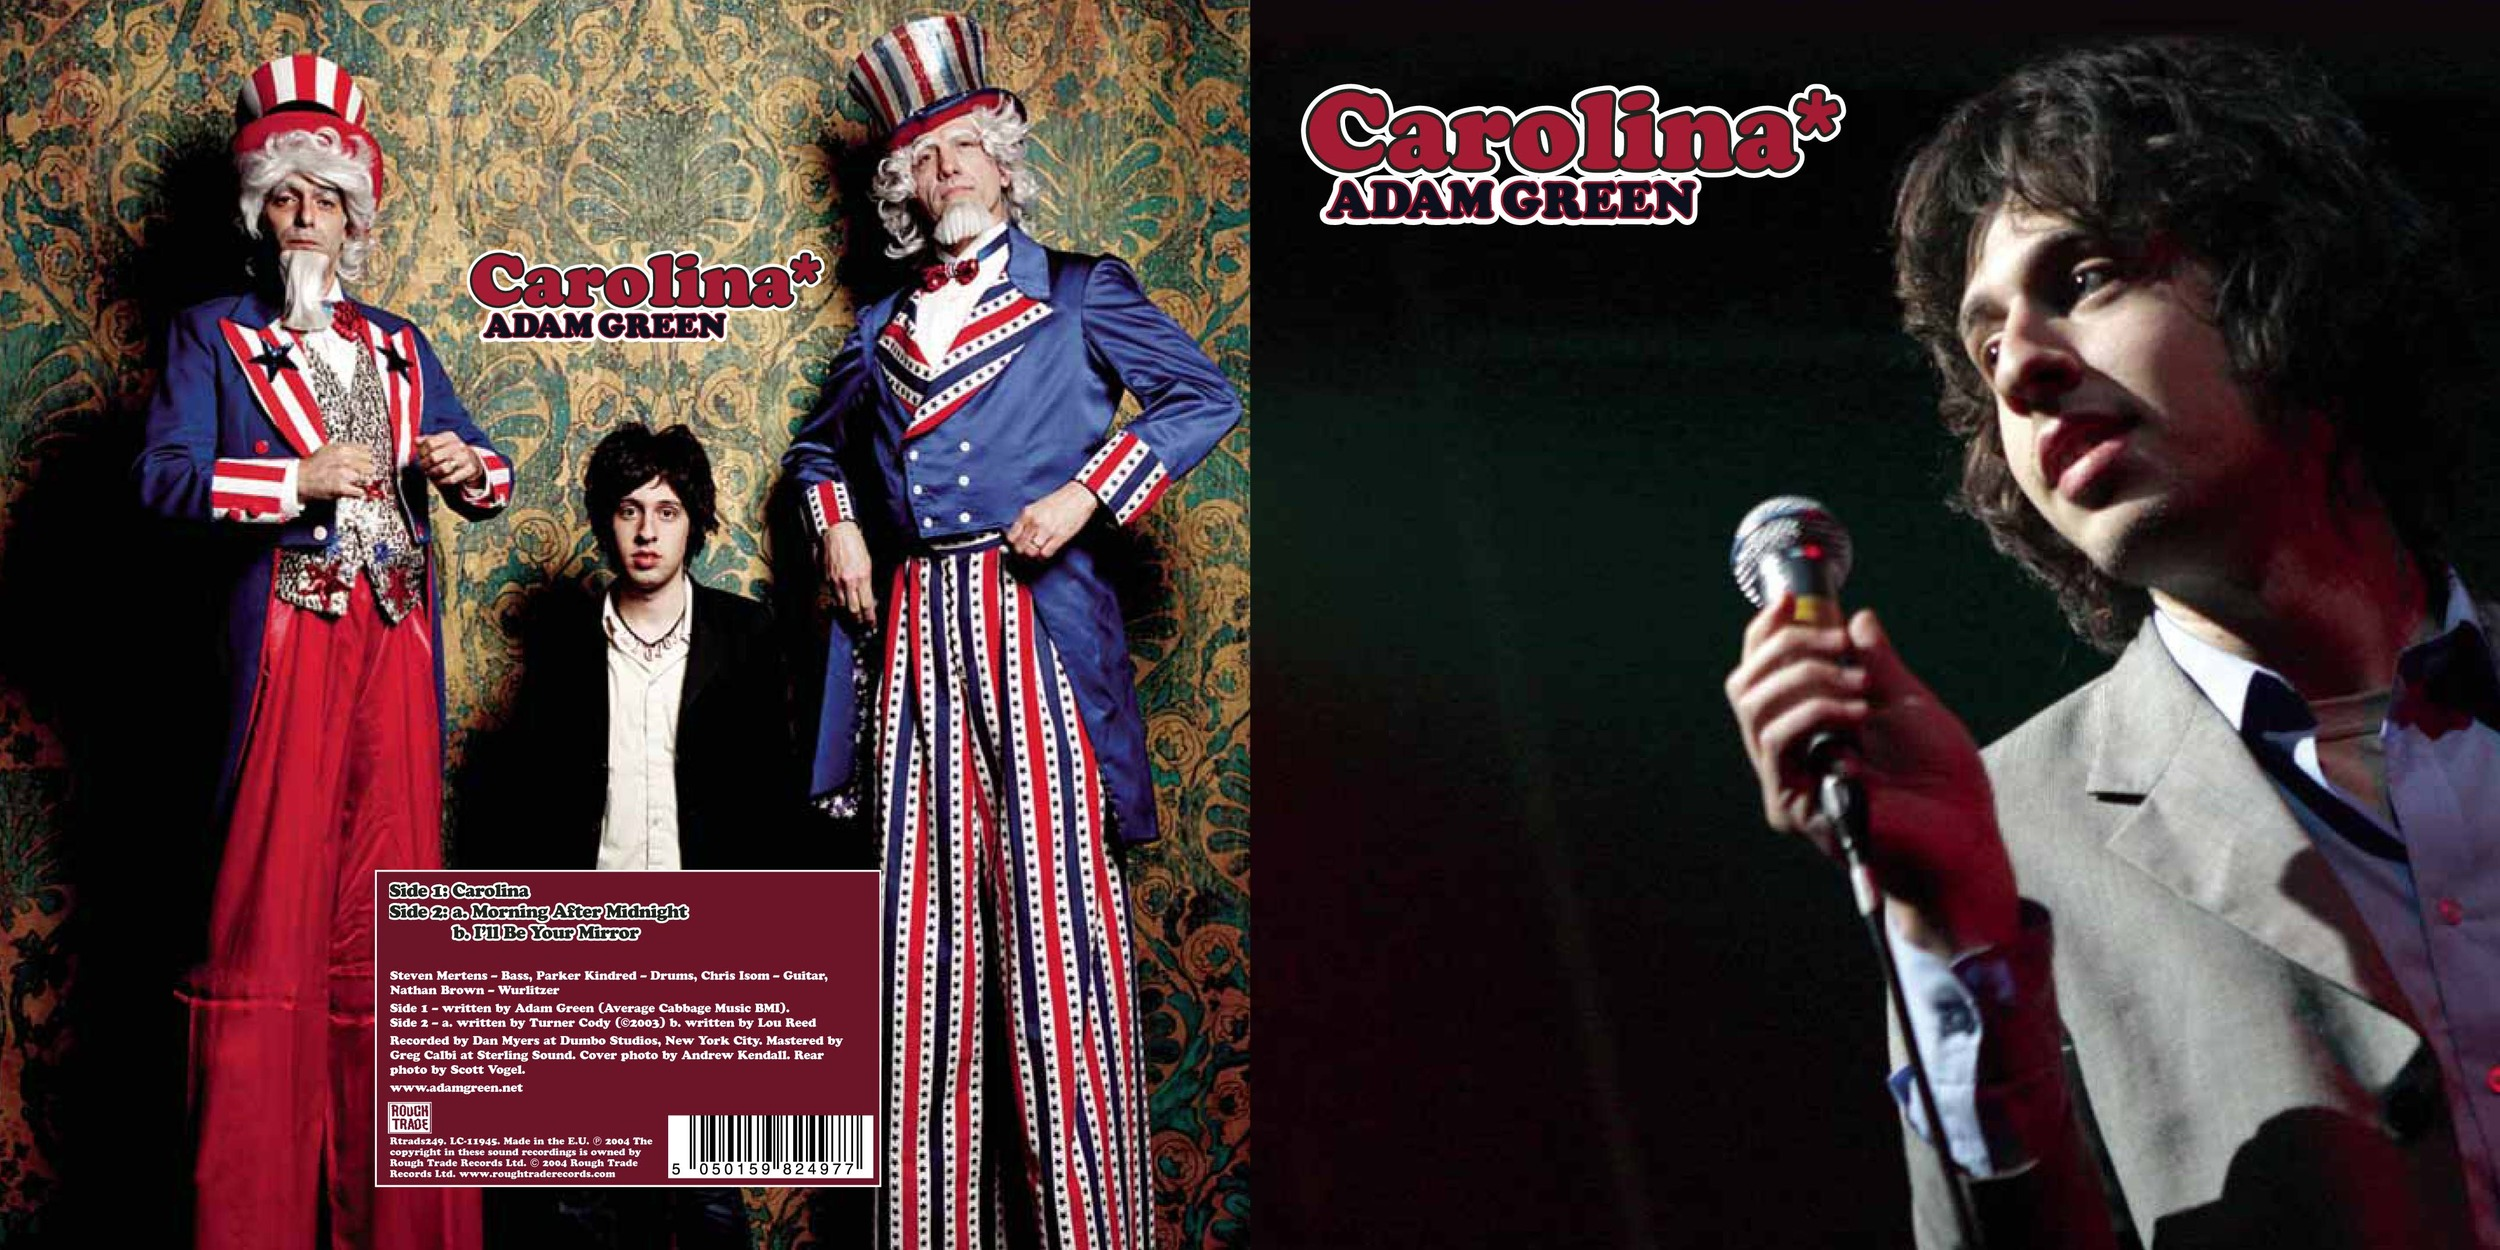 Carolina CD case.jpg